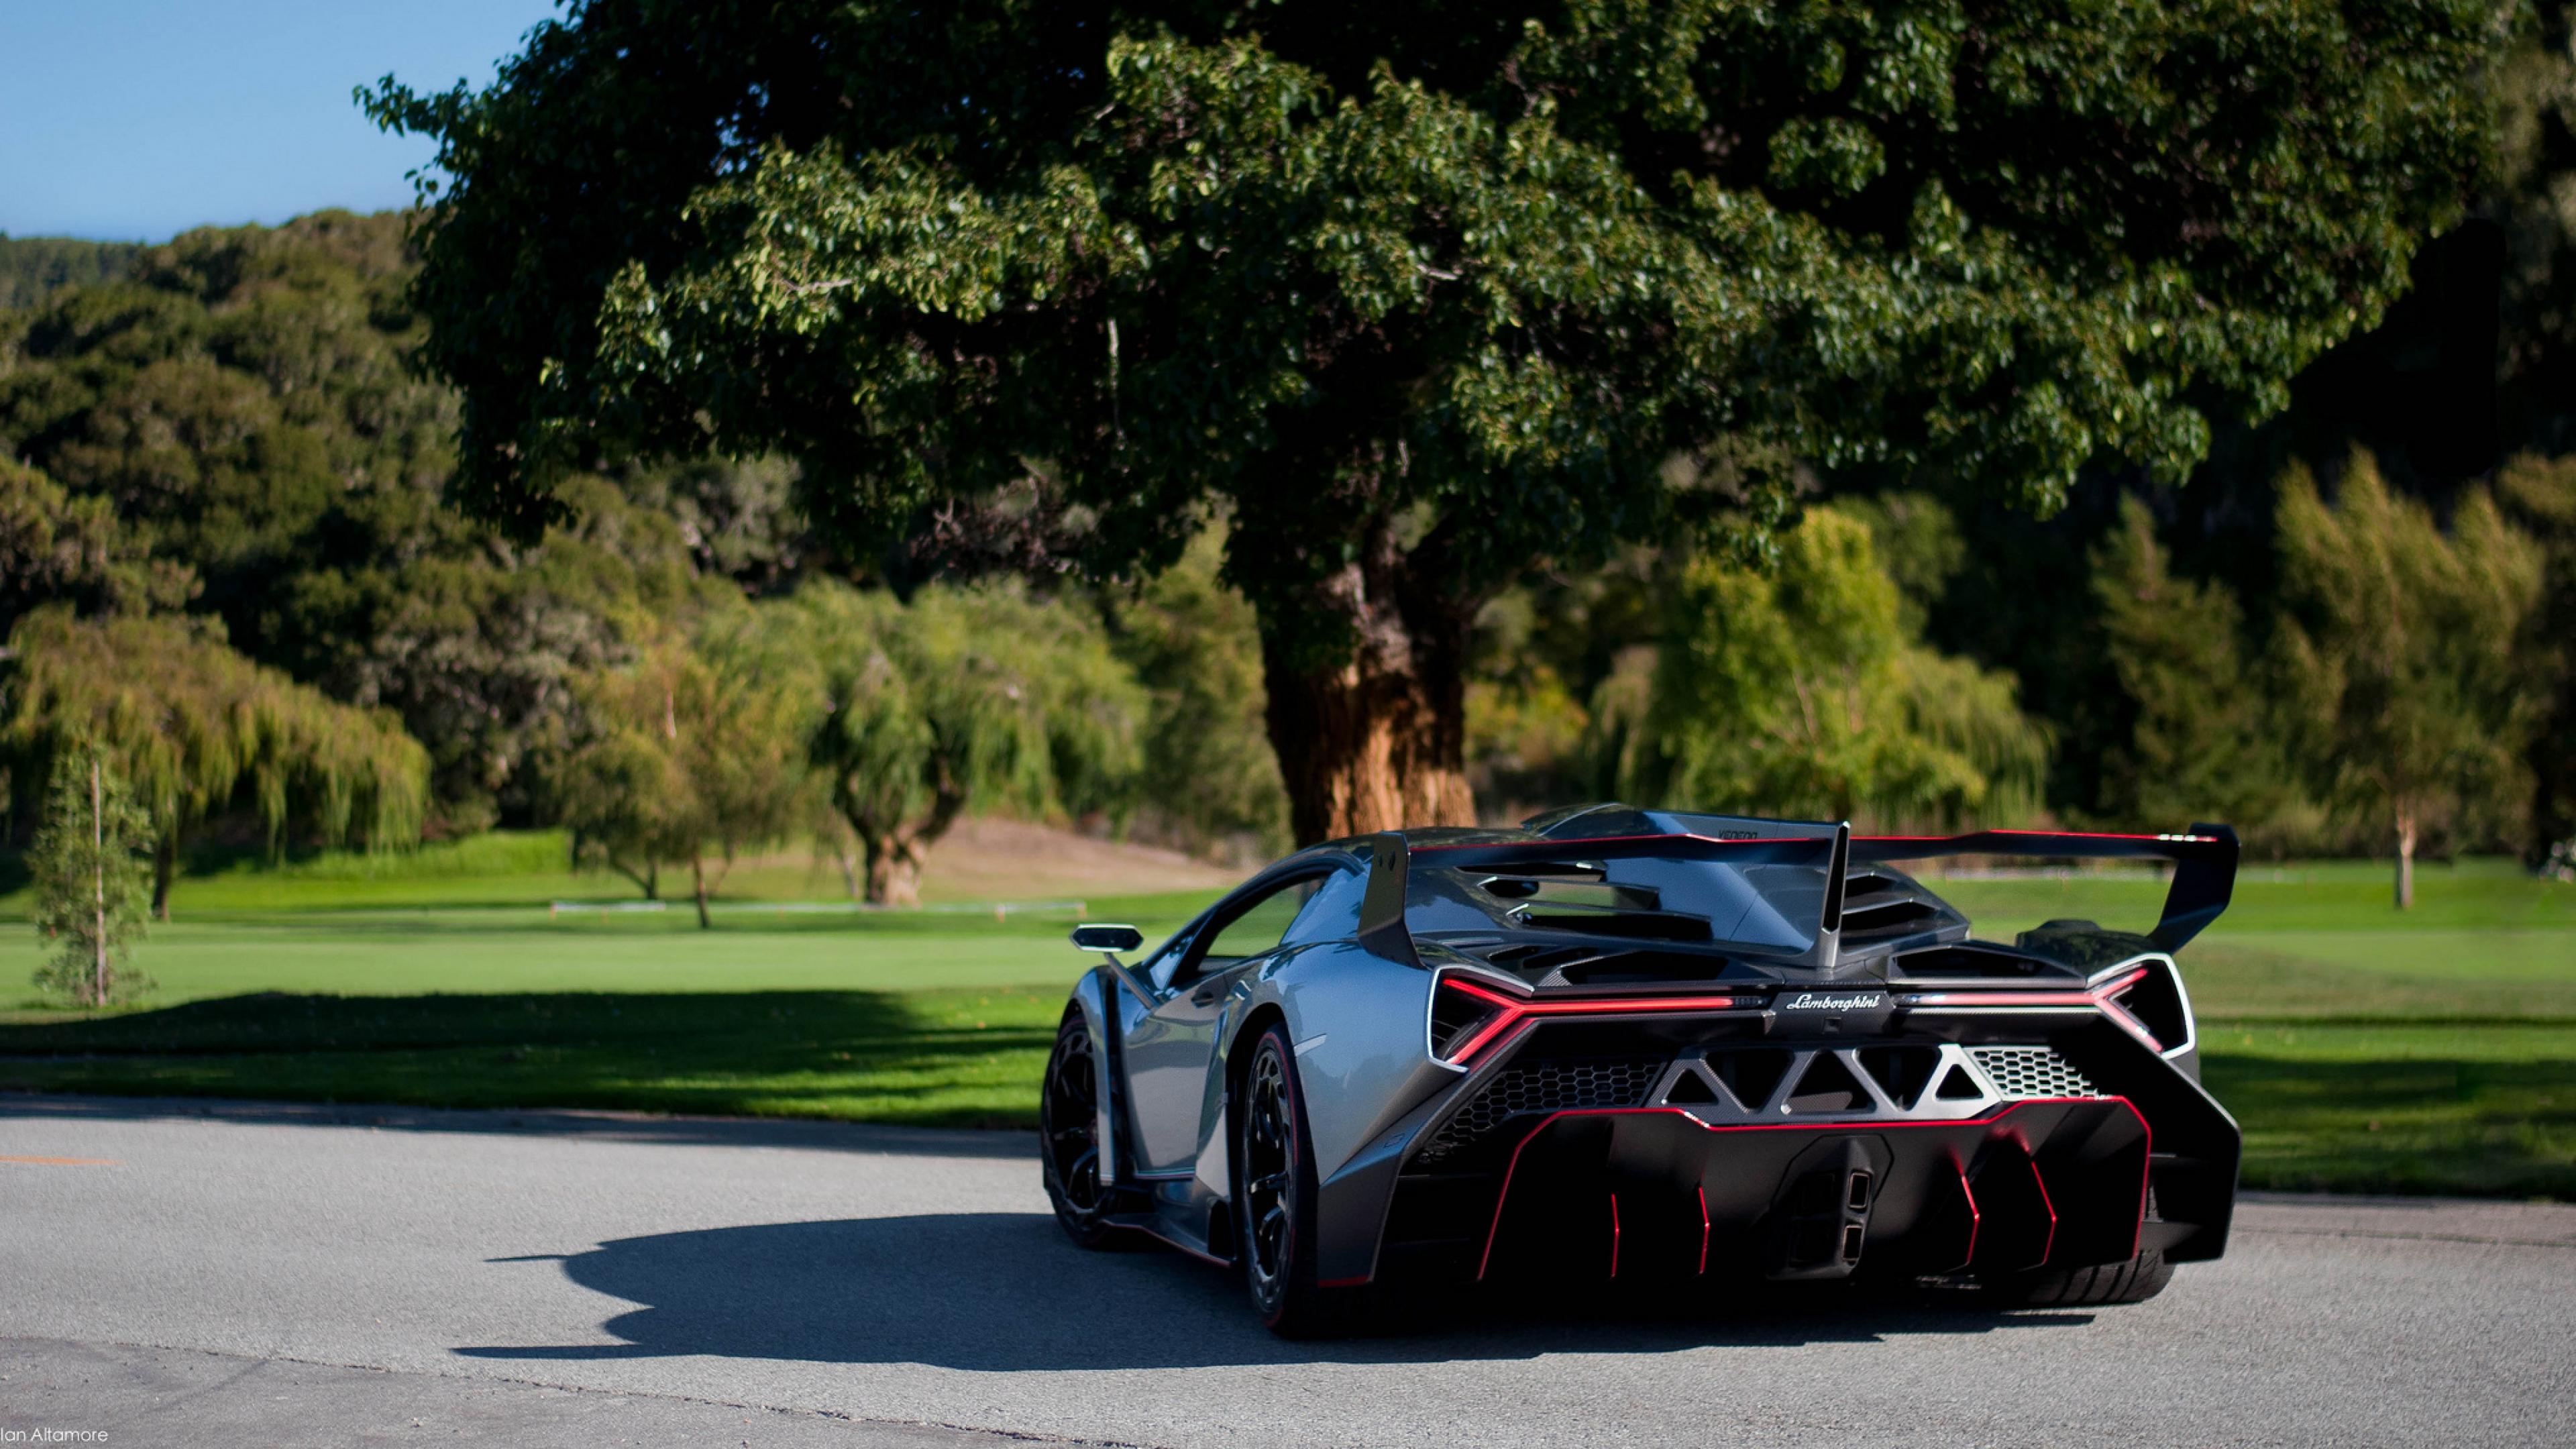 Car Wallpapers Lamborghini Veneno Supercar Hd Cars 4k Wallpapers